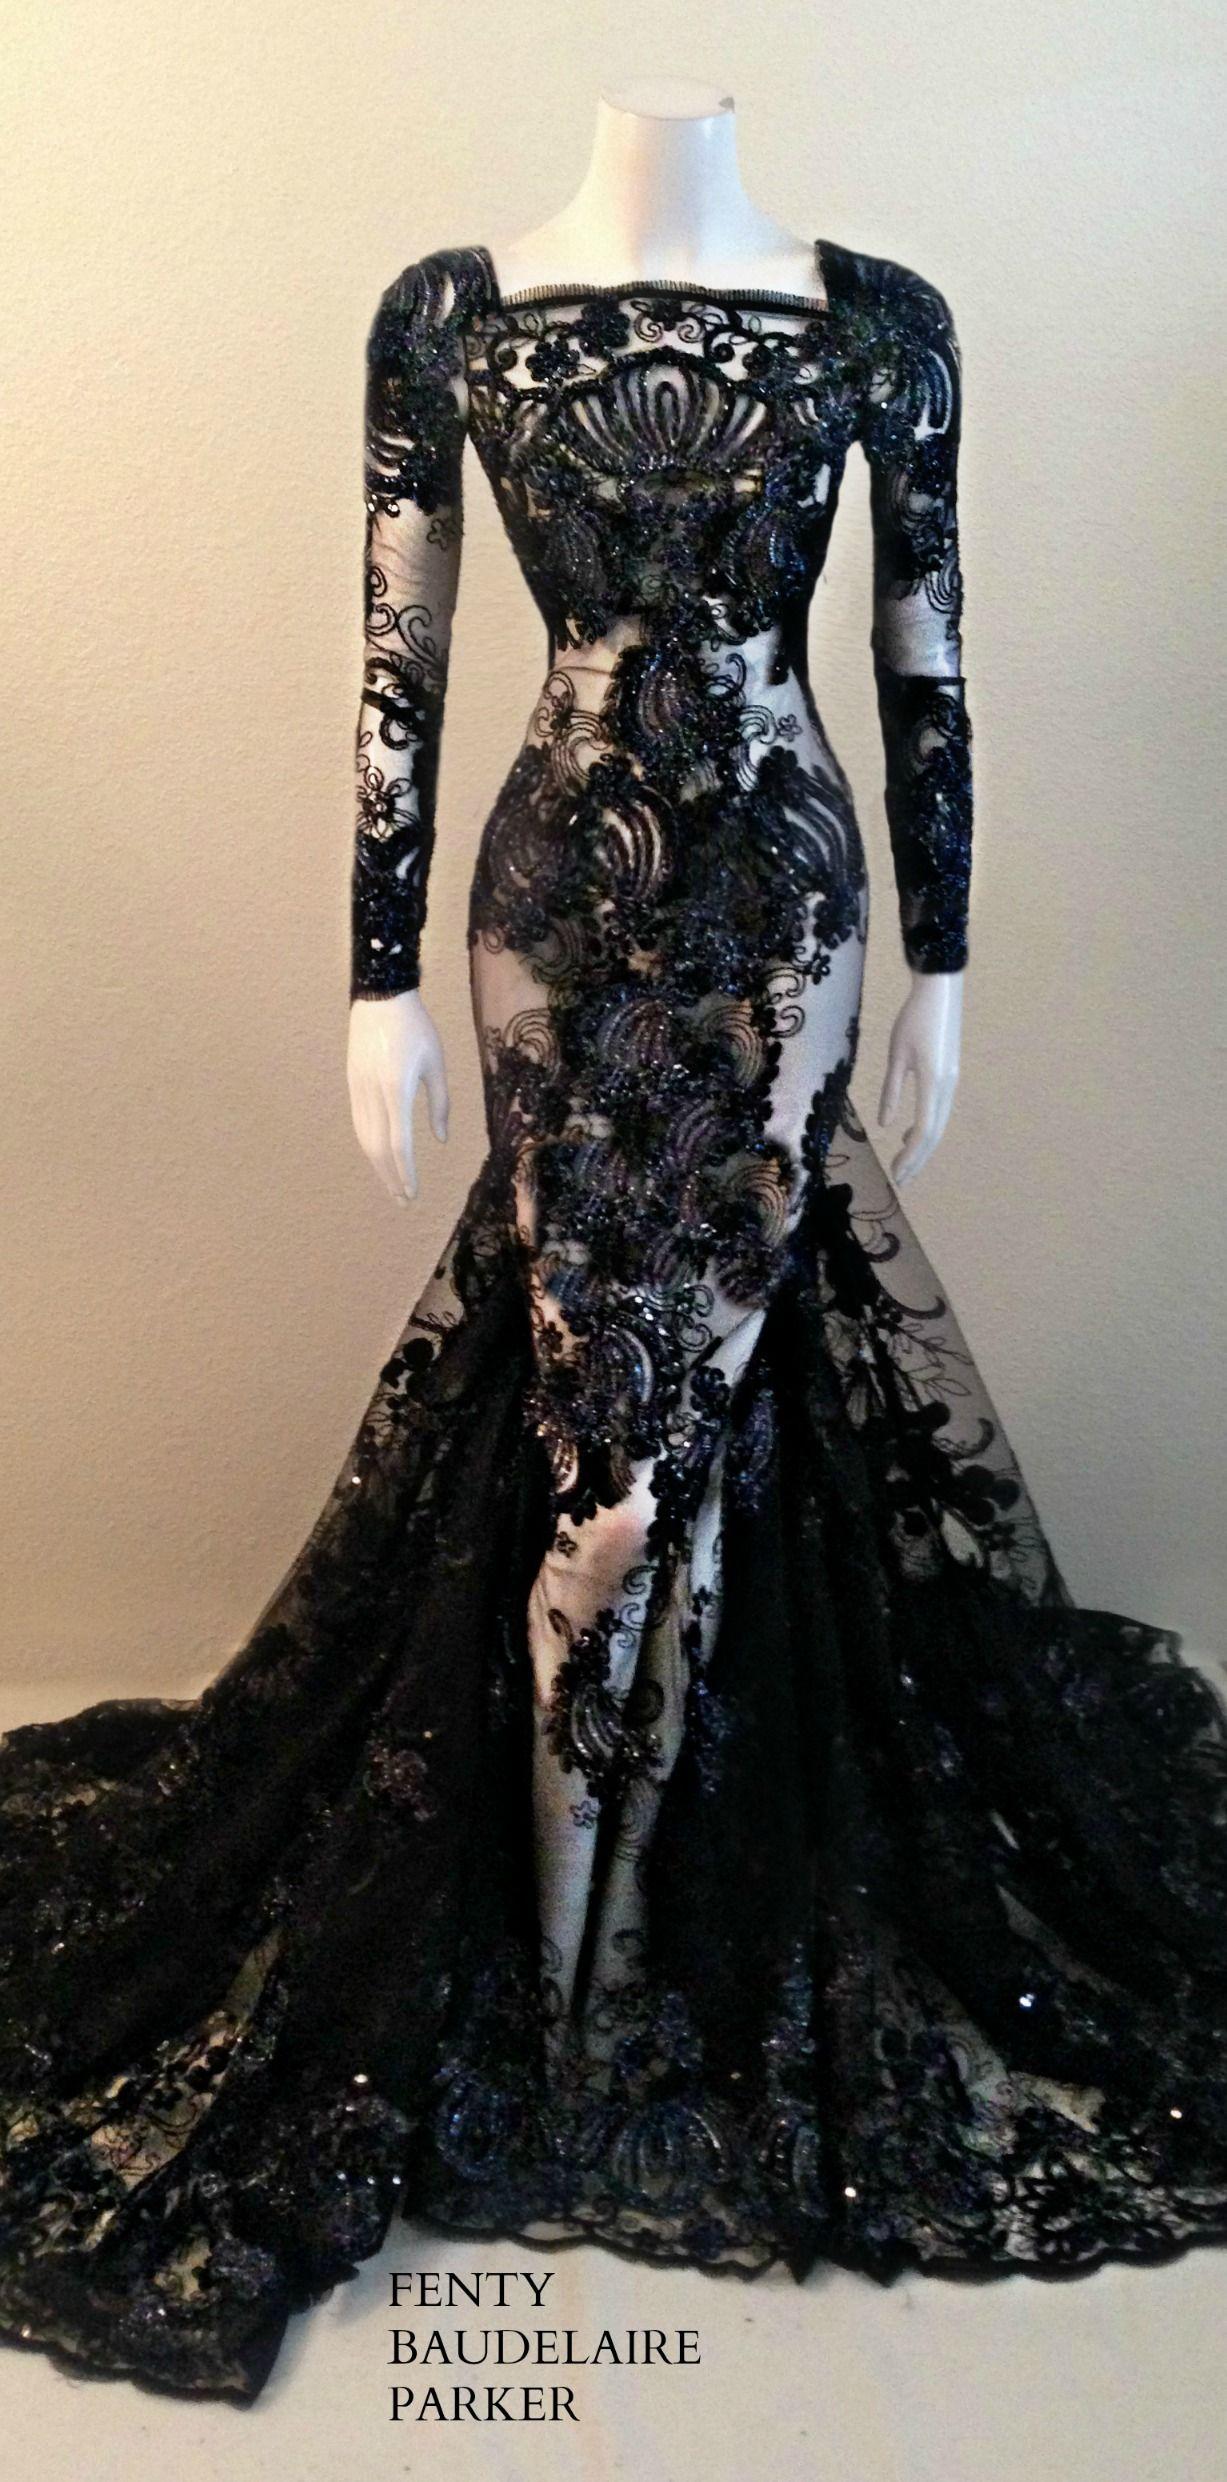 The fenty baudelaire parker she wore black fancy weddings